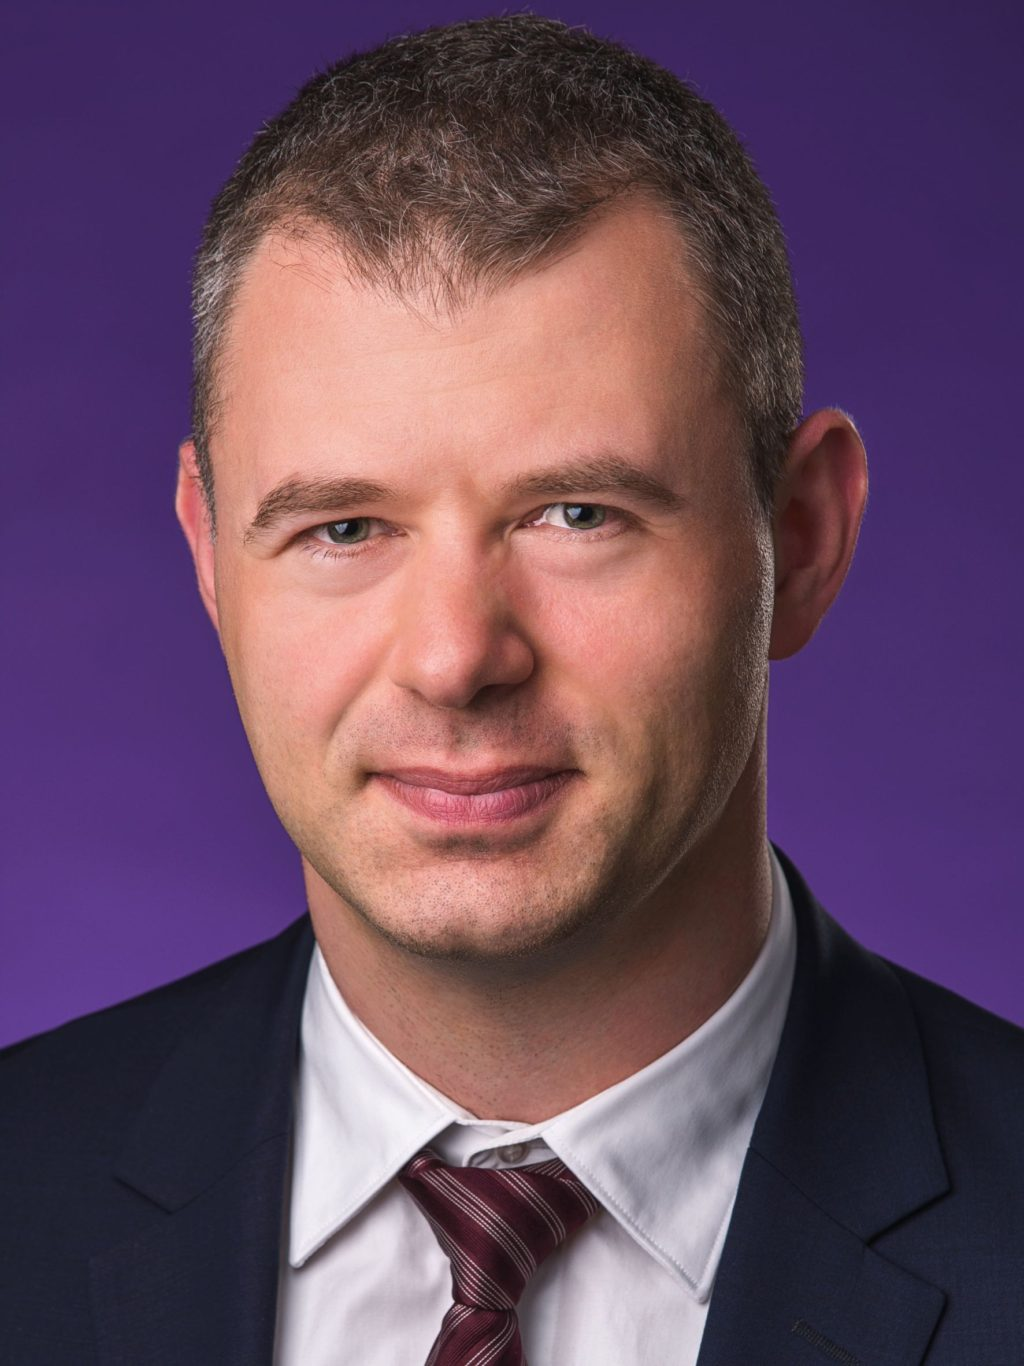 Adrian Șter